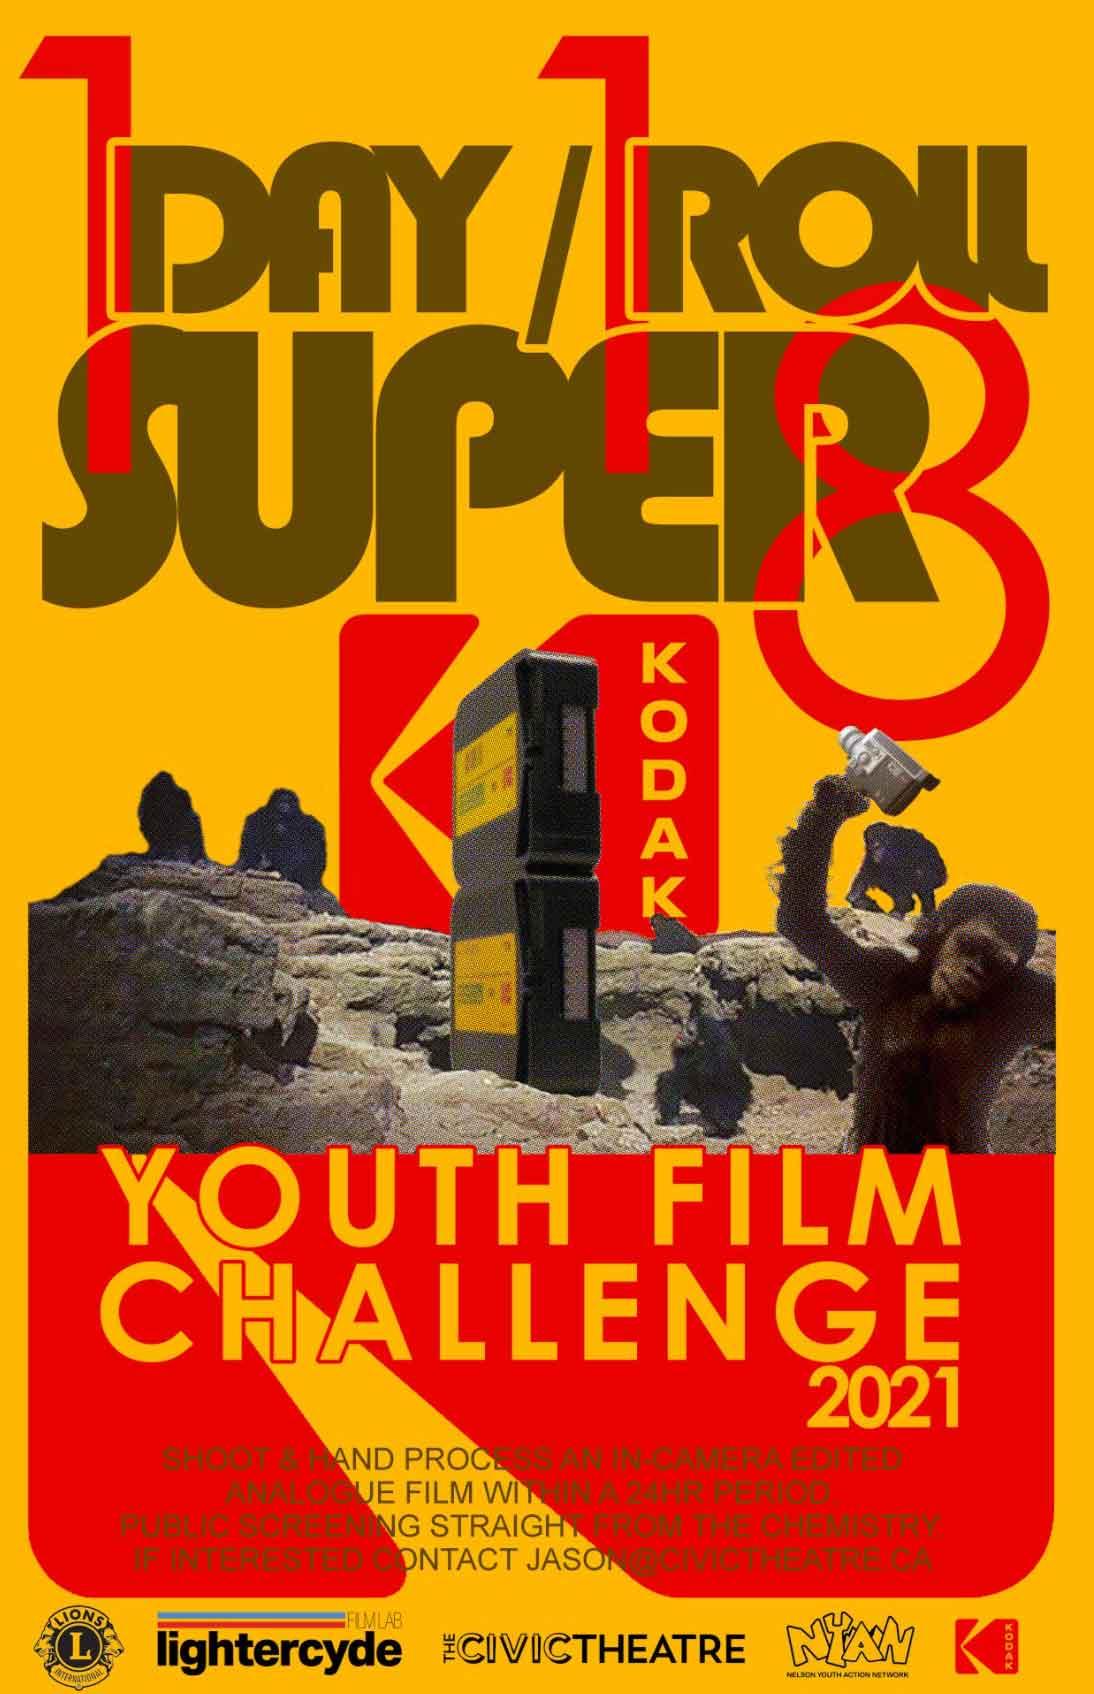 Super 8 film challenge 2021 poster